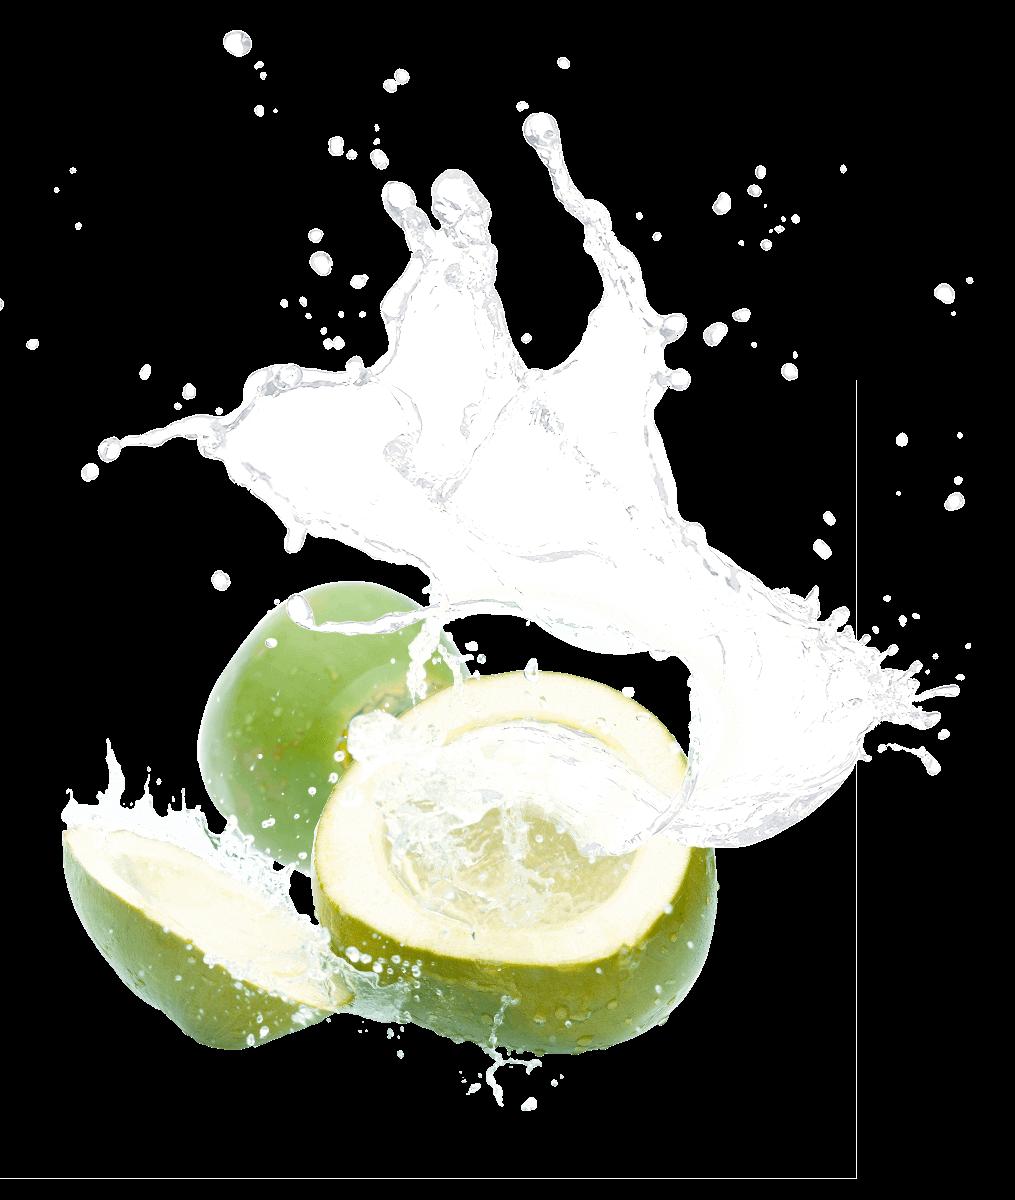 frische Kokosnuss